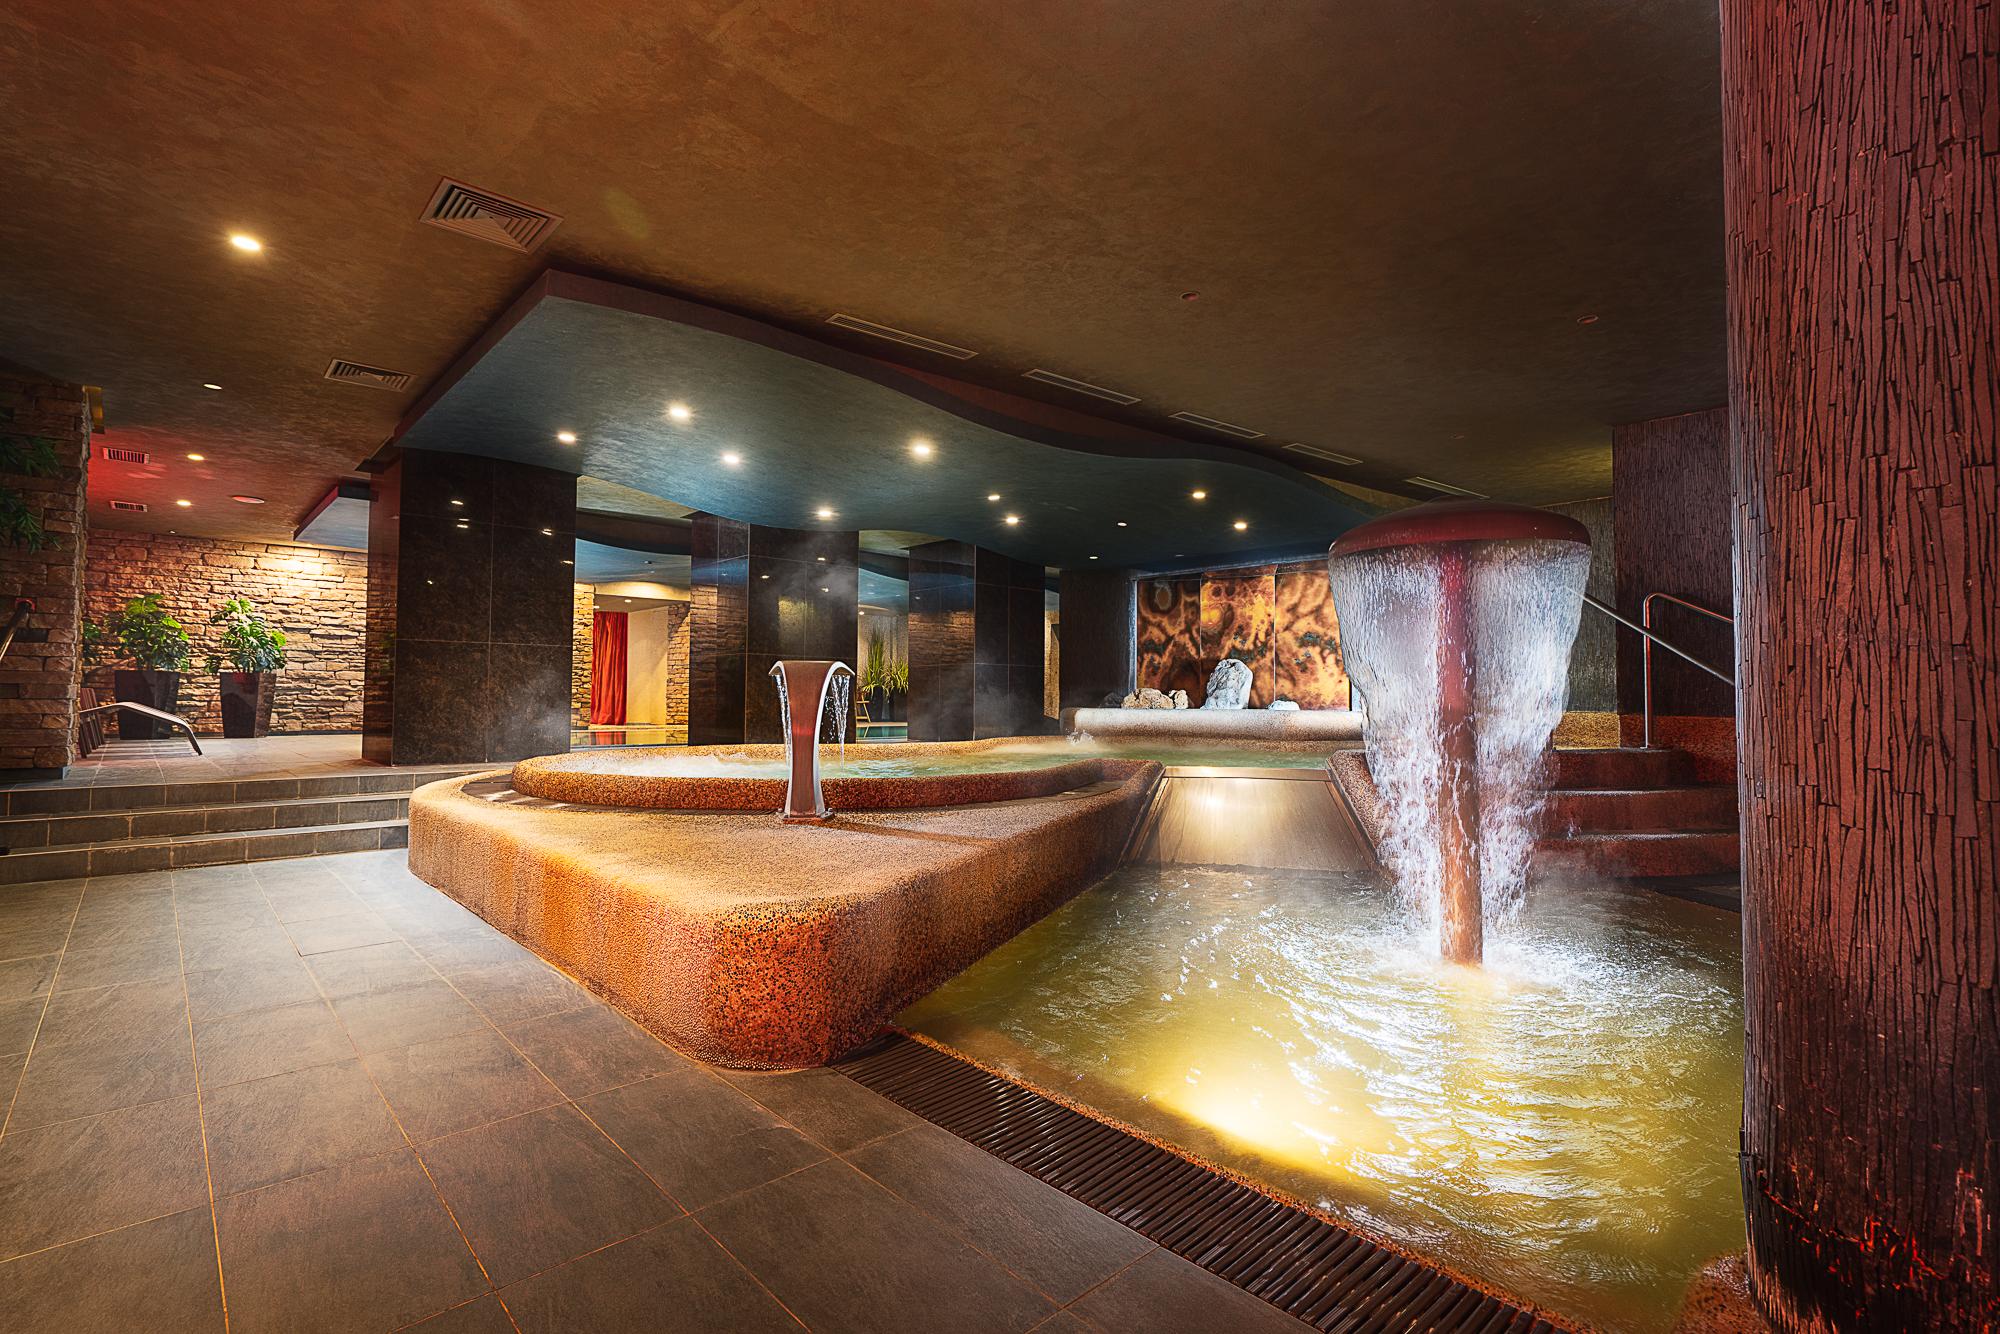 https://cms.satur.sk/data/imgs/tour_image/orig/hotel_termal_vyhne-0-1802497.jpg